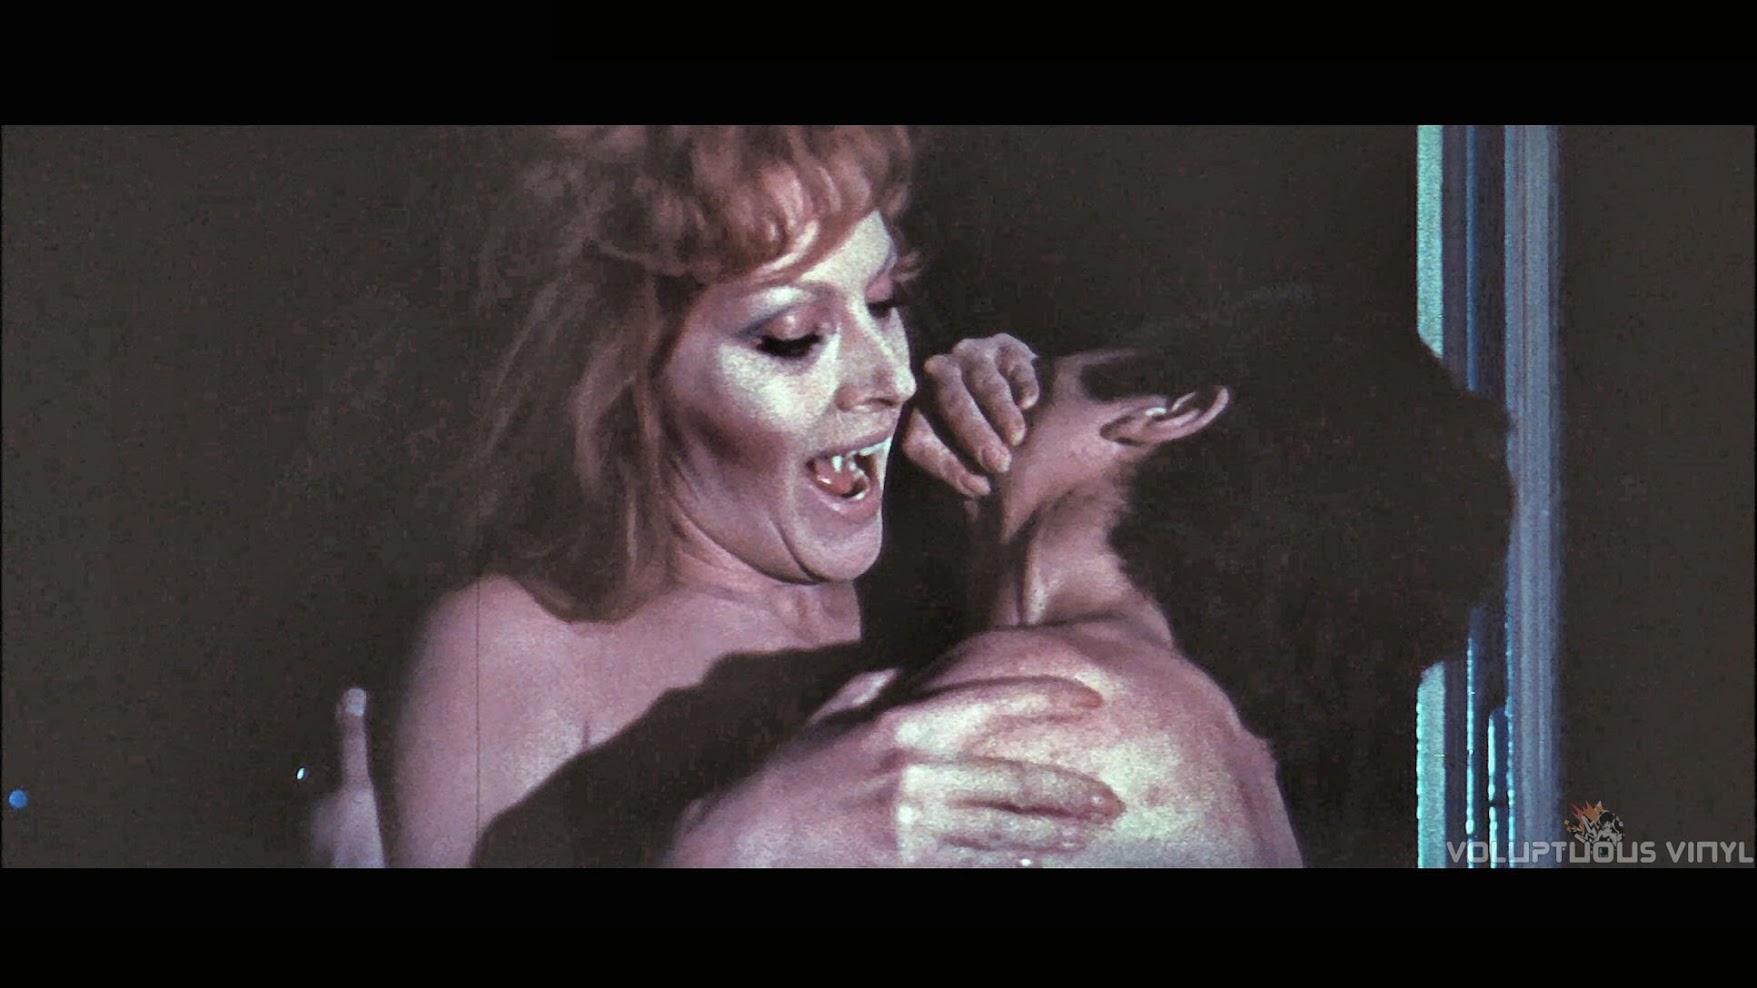 Helga Line taking a bite, in The Vampires Night Orgy